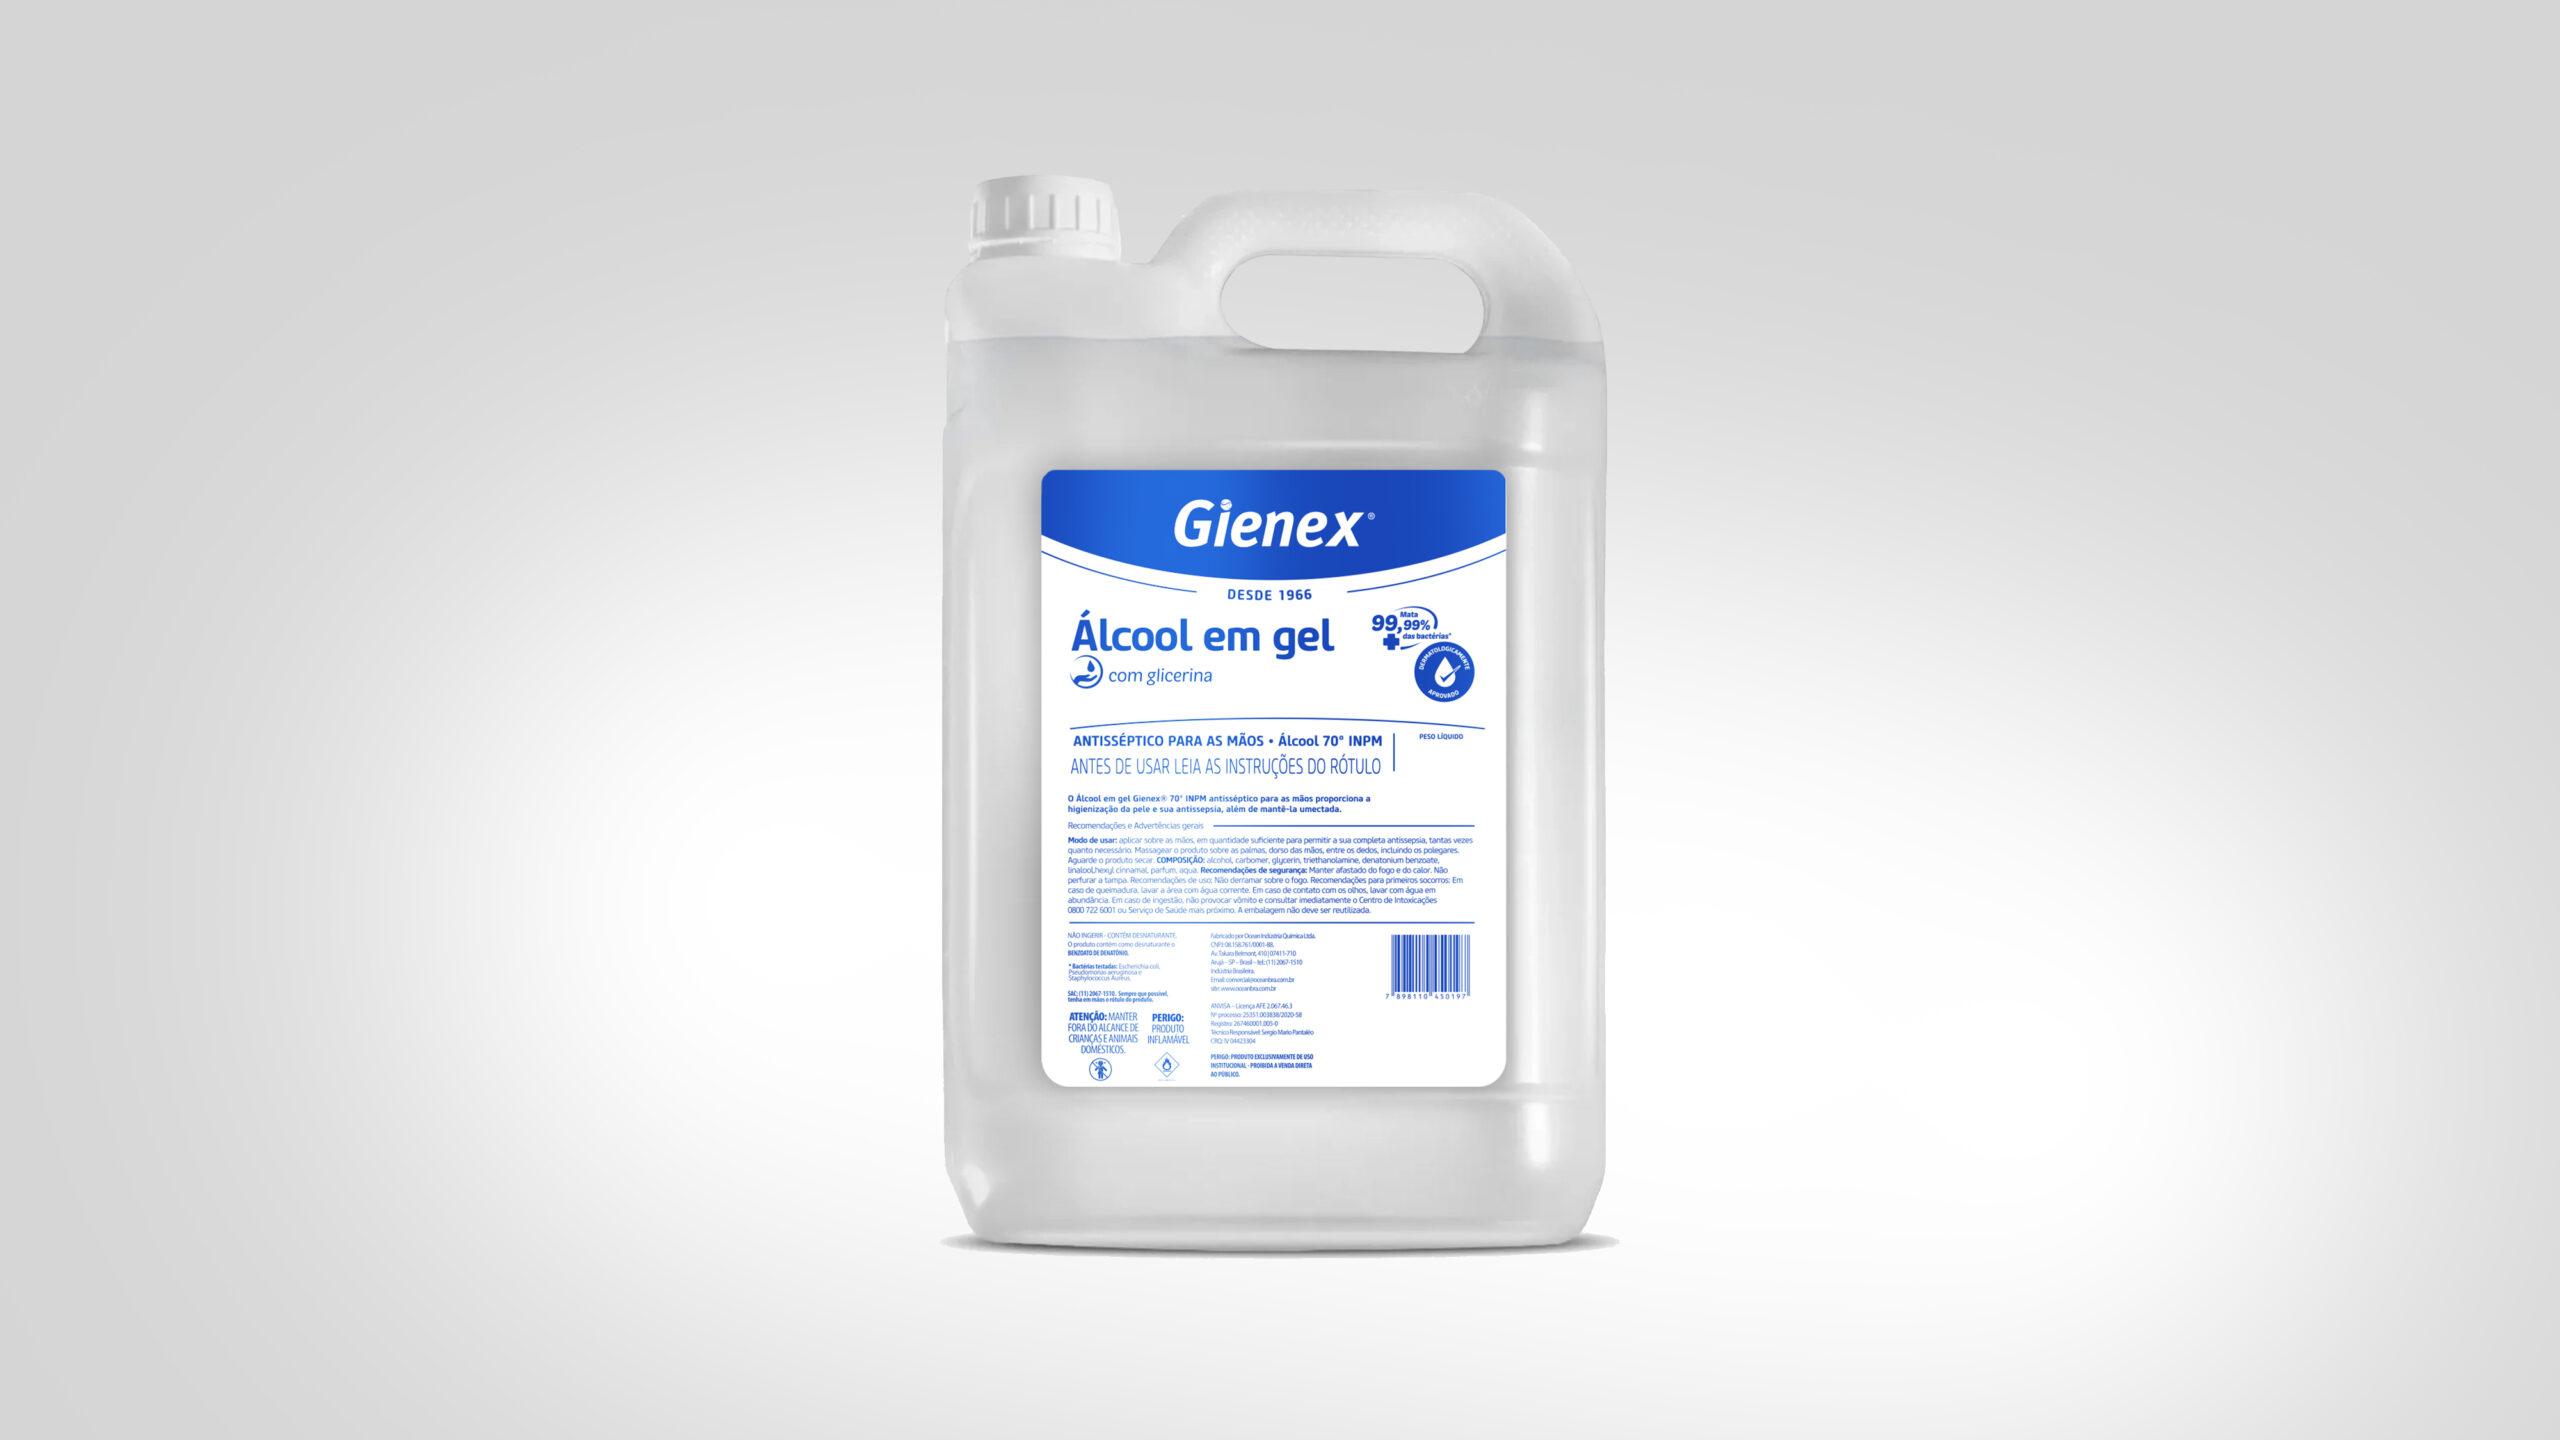 Lanatta-Branding-and-Design-Alcool-em-Gel-Gienex-2